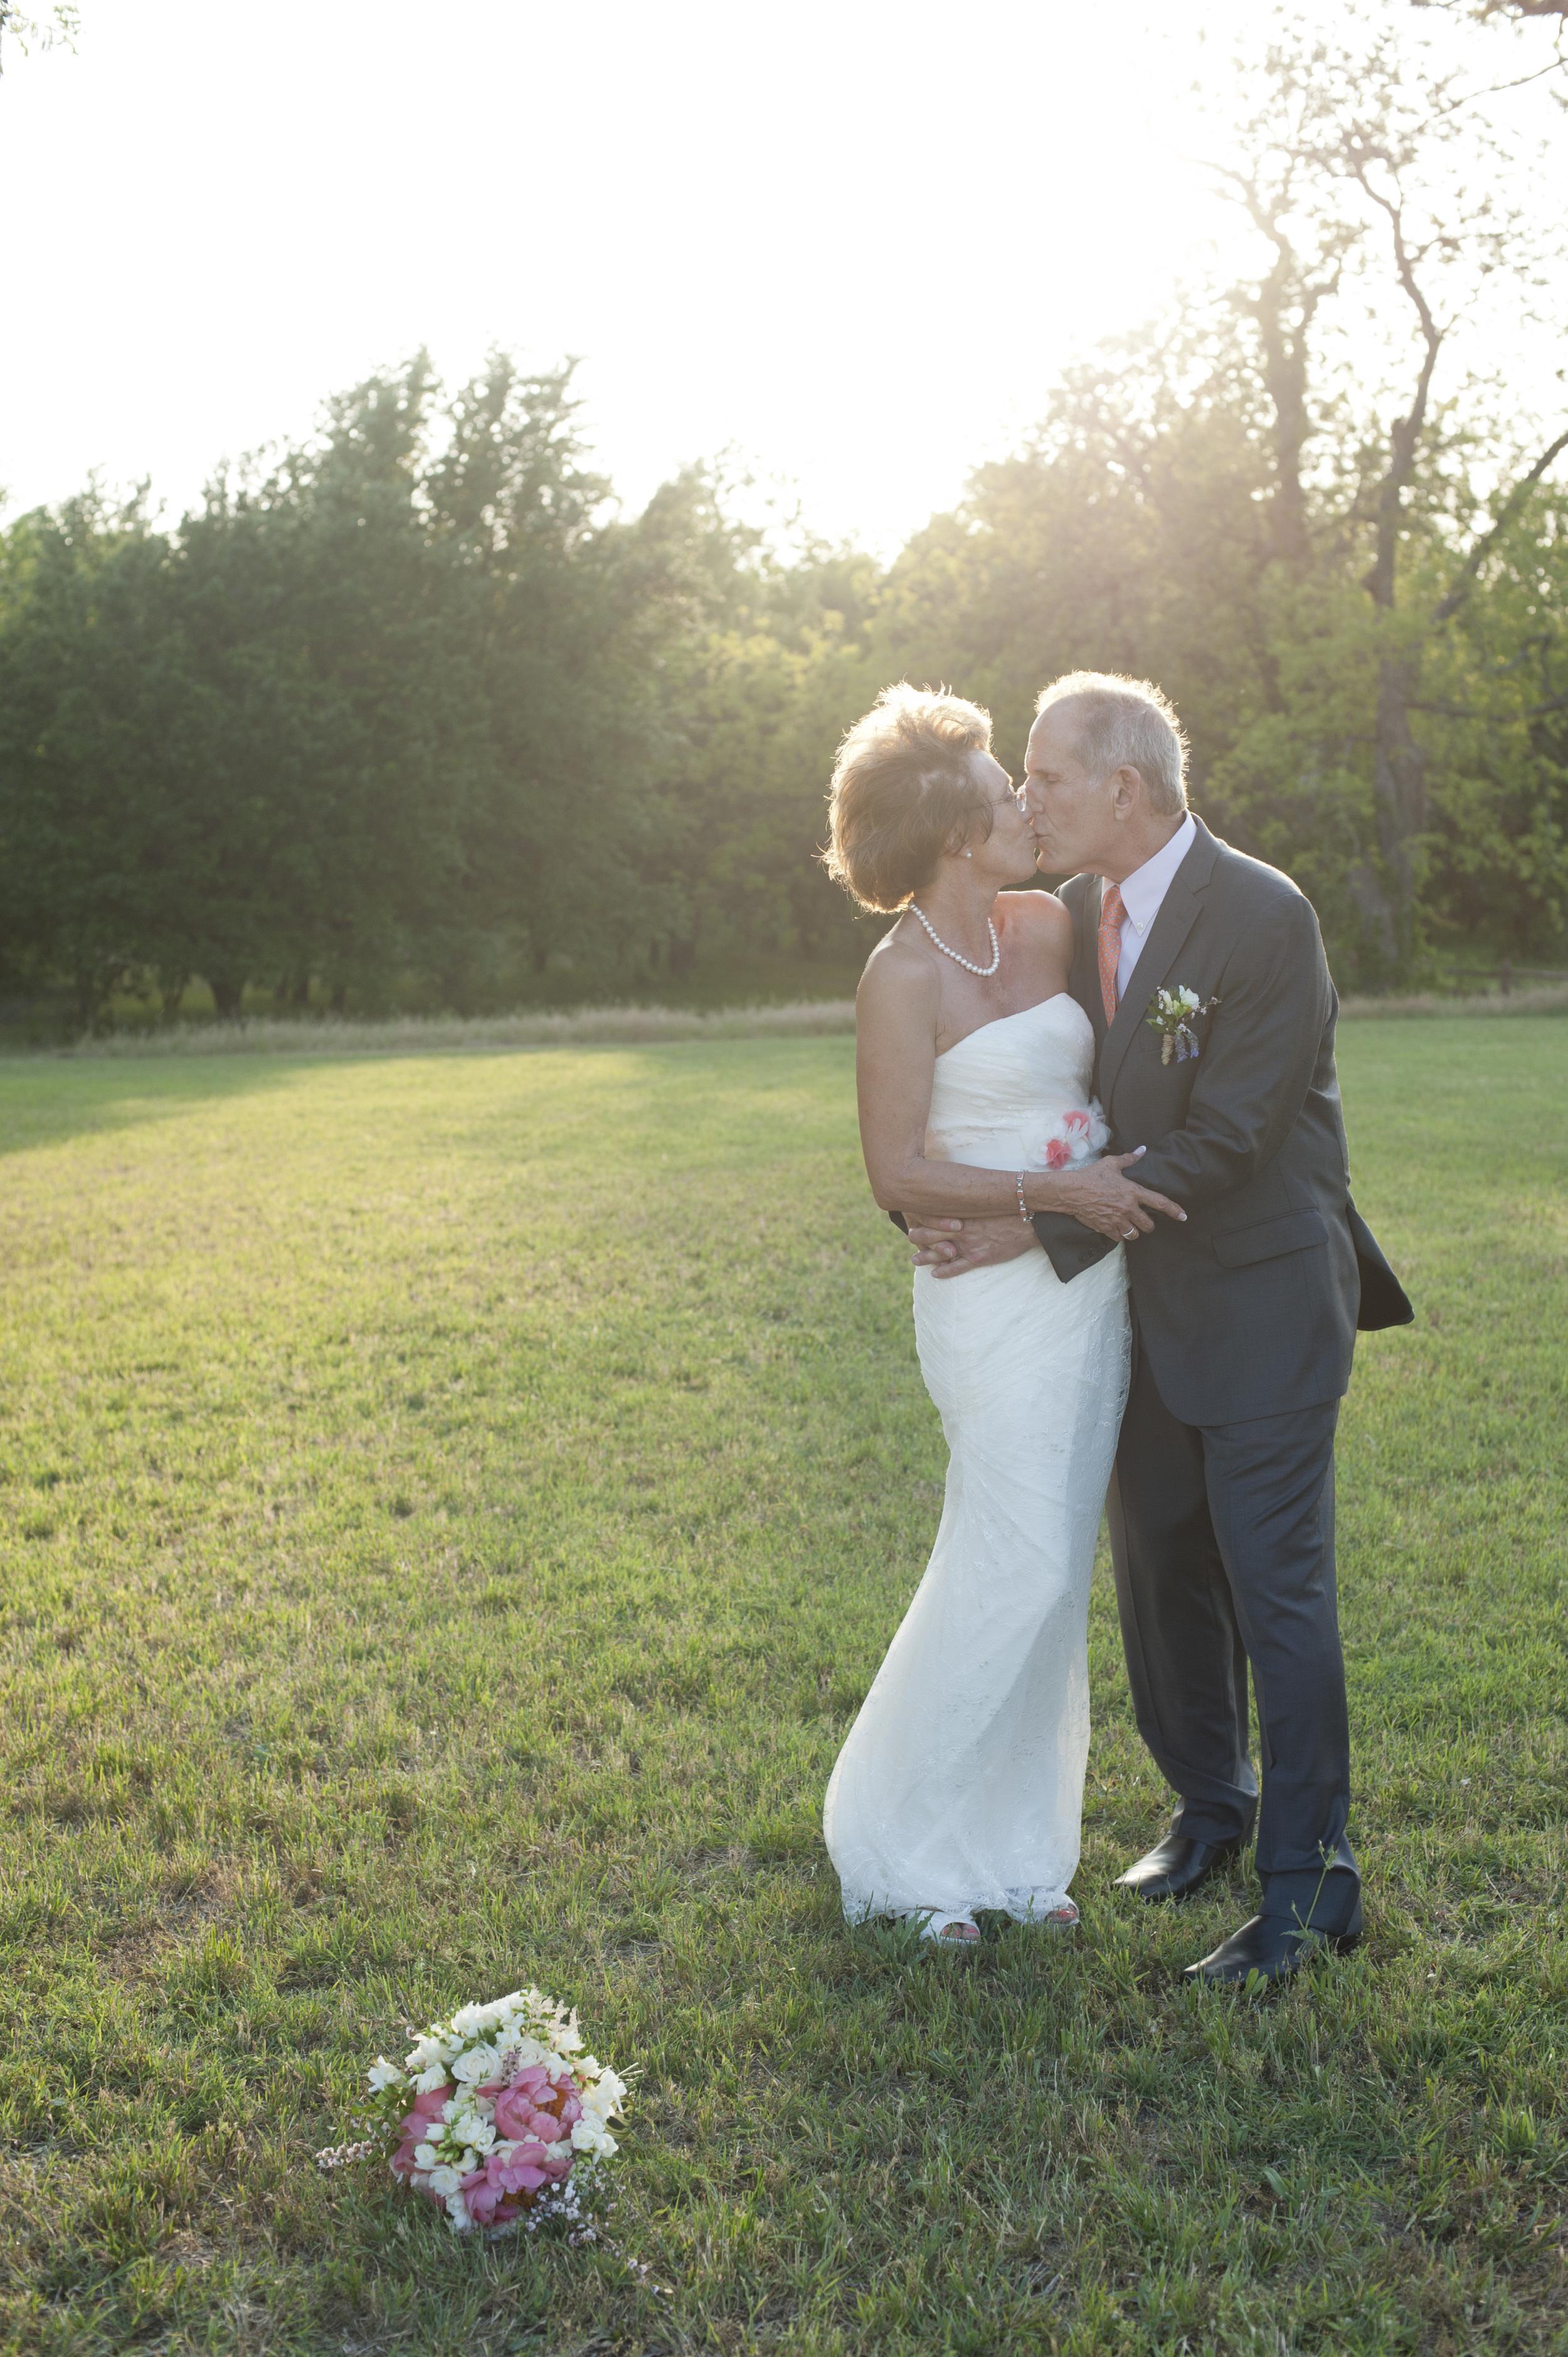 Outdoor Wedding in Grapevine